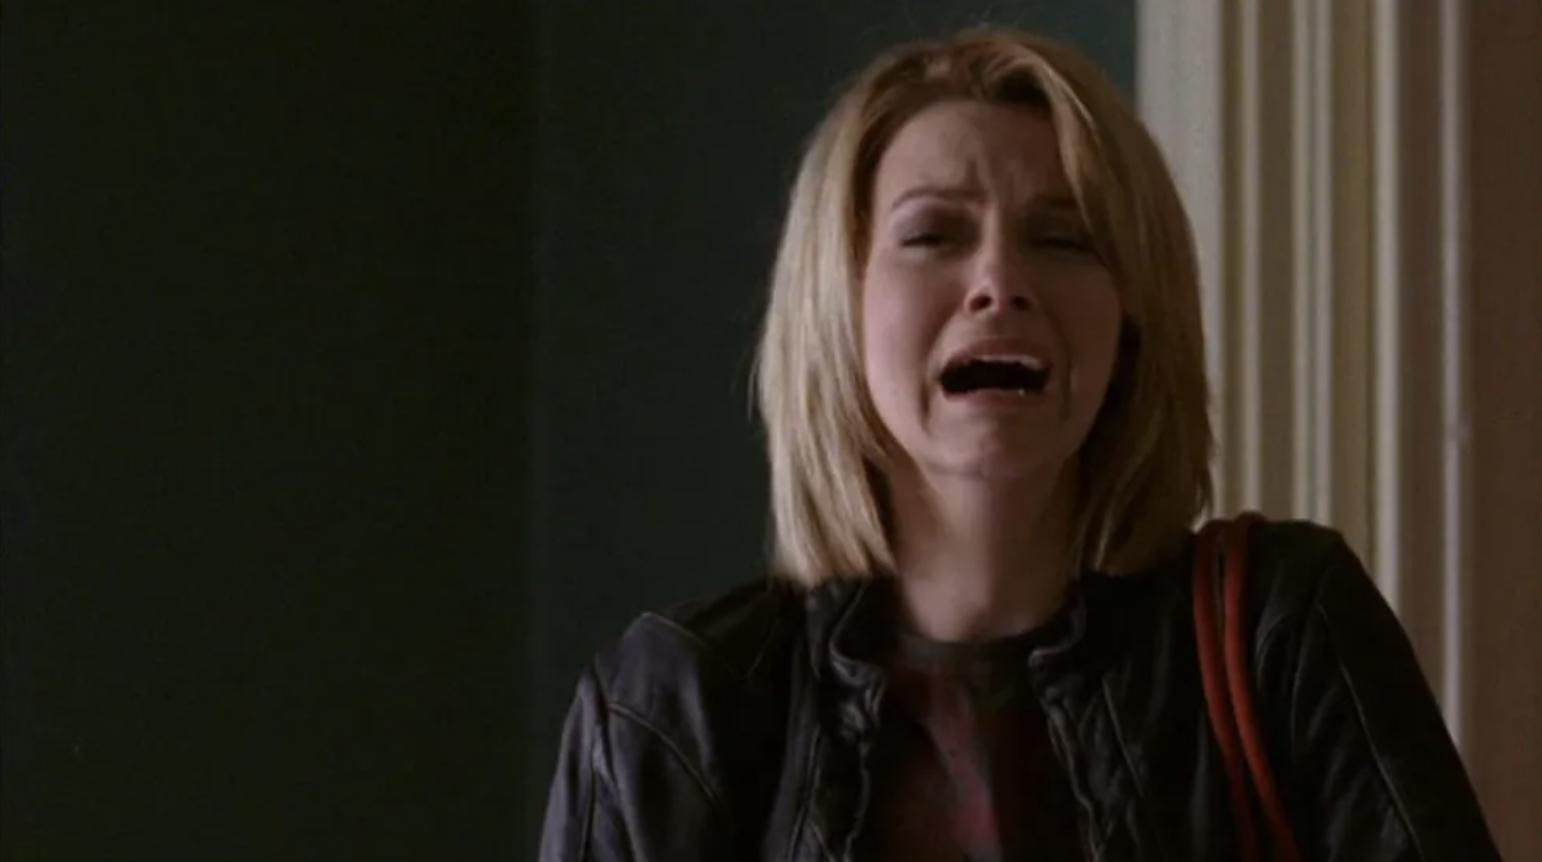 Peyton crying and screaming